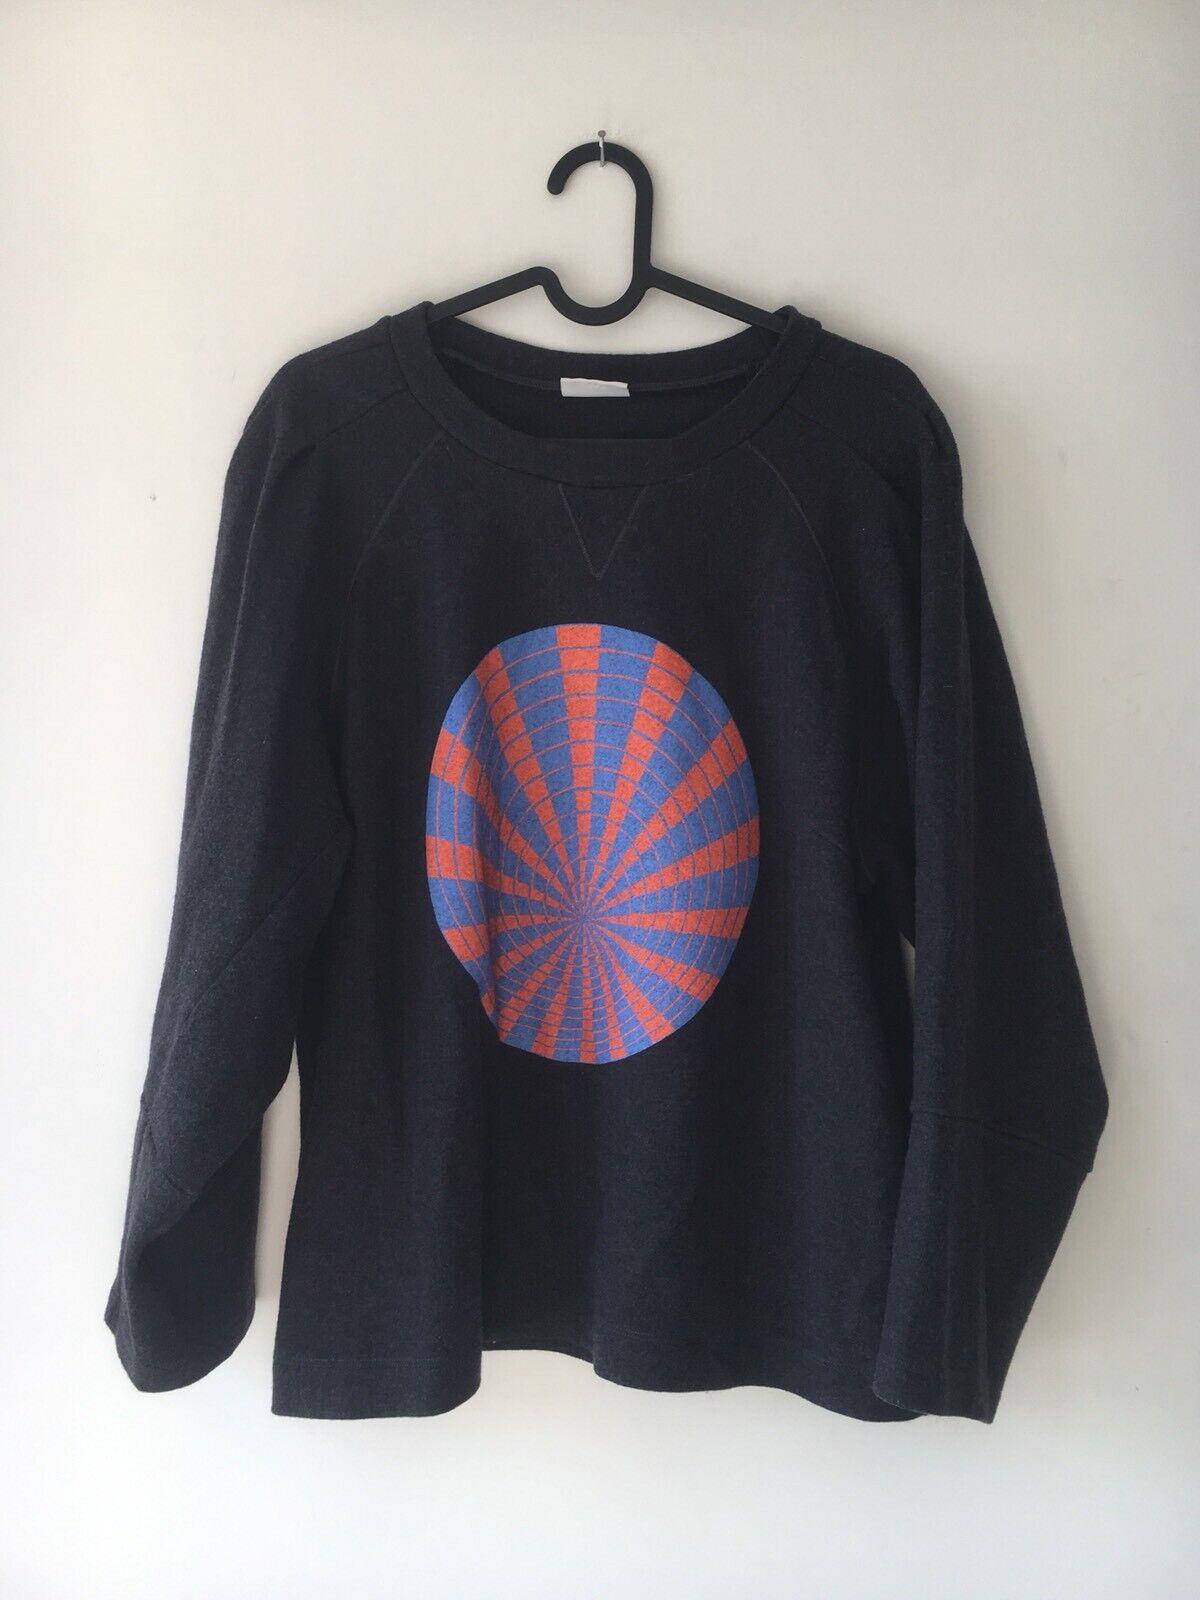 Dries Van Noten Wool Sweater Top Größe Large